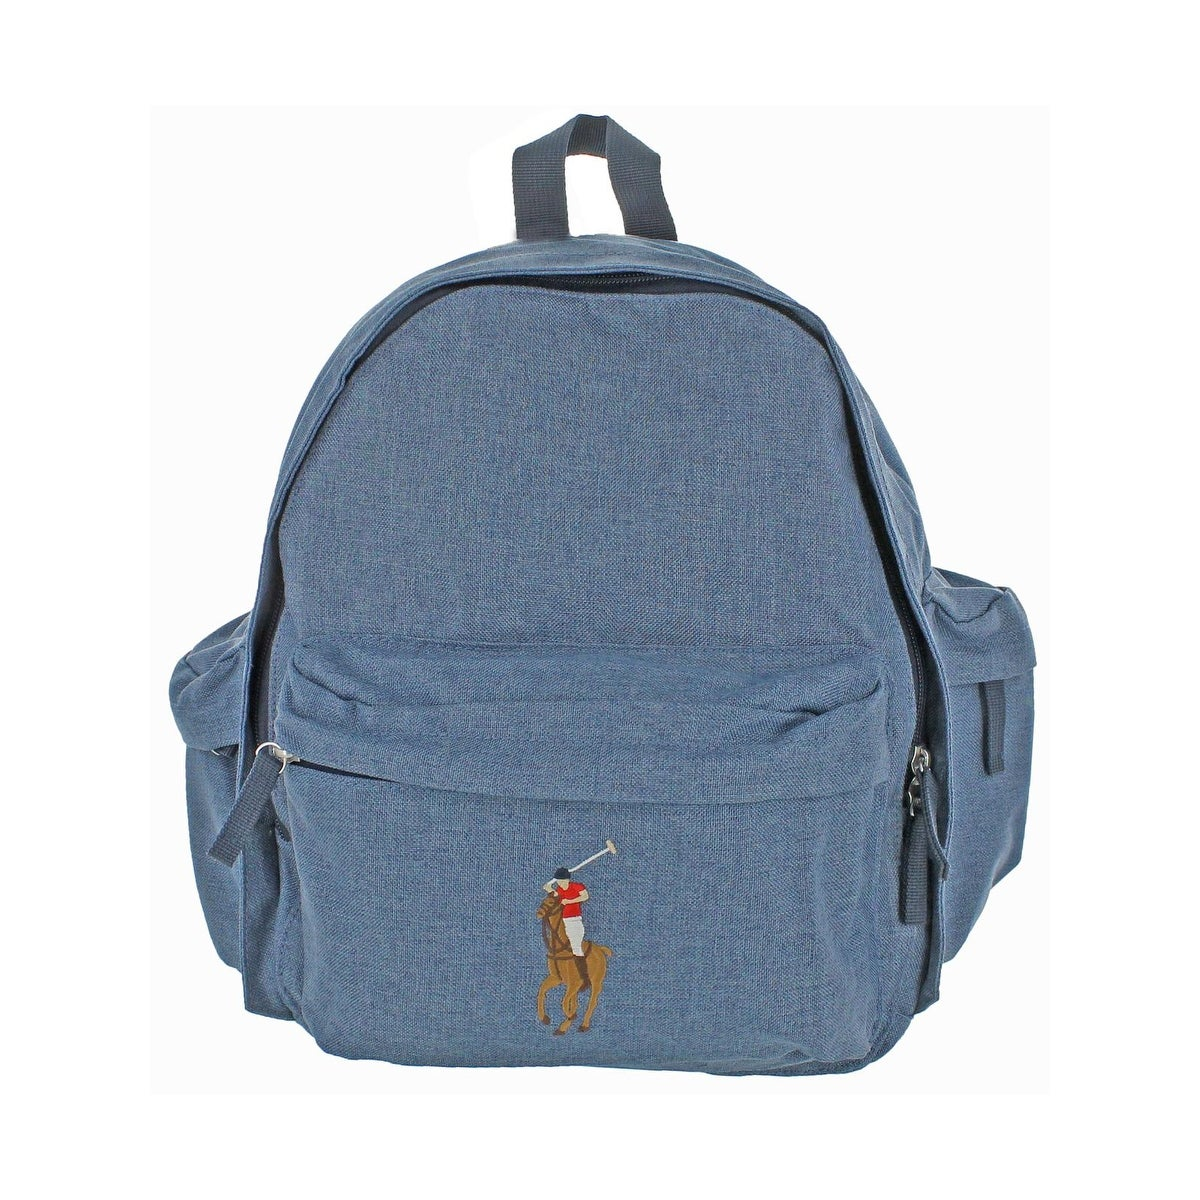 Ralph Lauren Big Pony Canvas Backpack- Fenix Toulouse Handball bd1b5acda4476